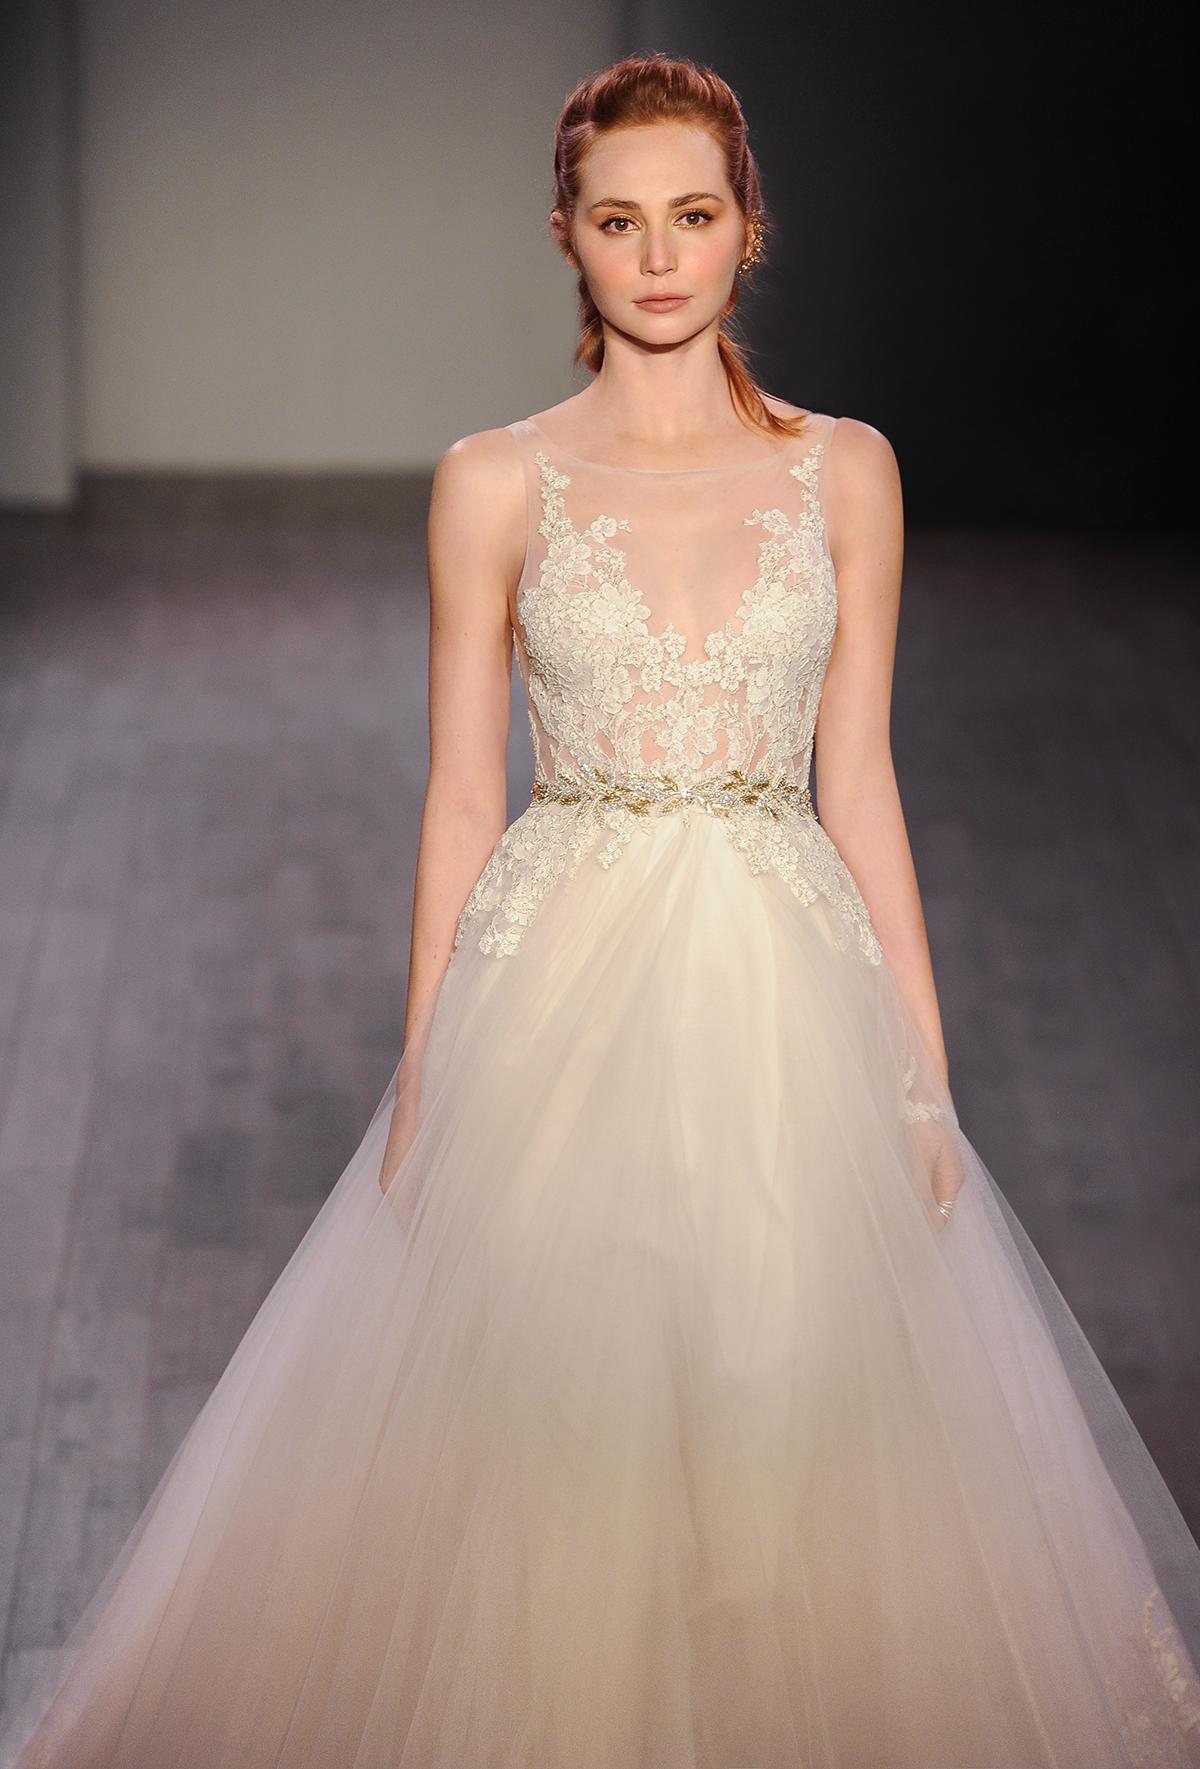 Where to buy lazaro wedding dresses